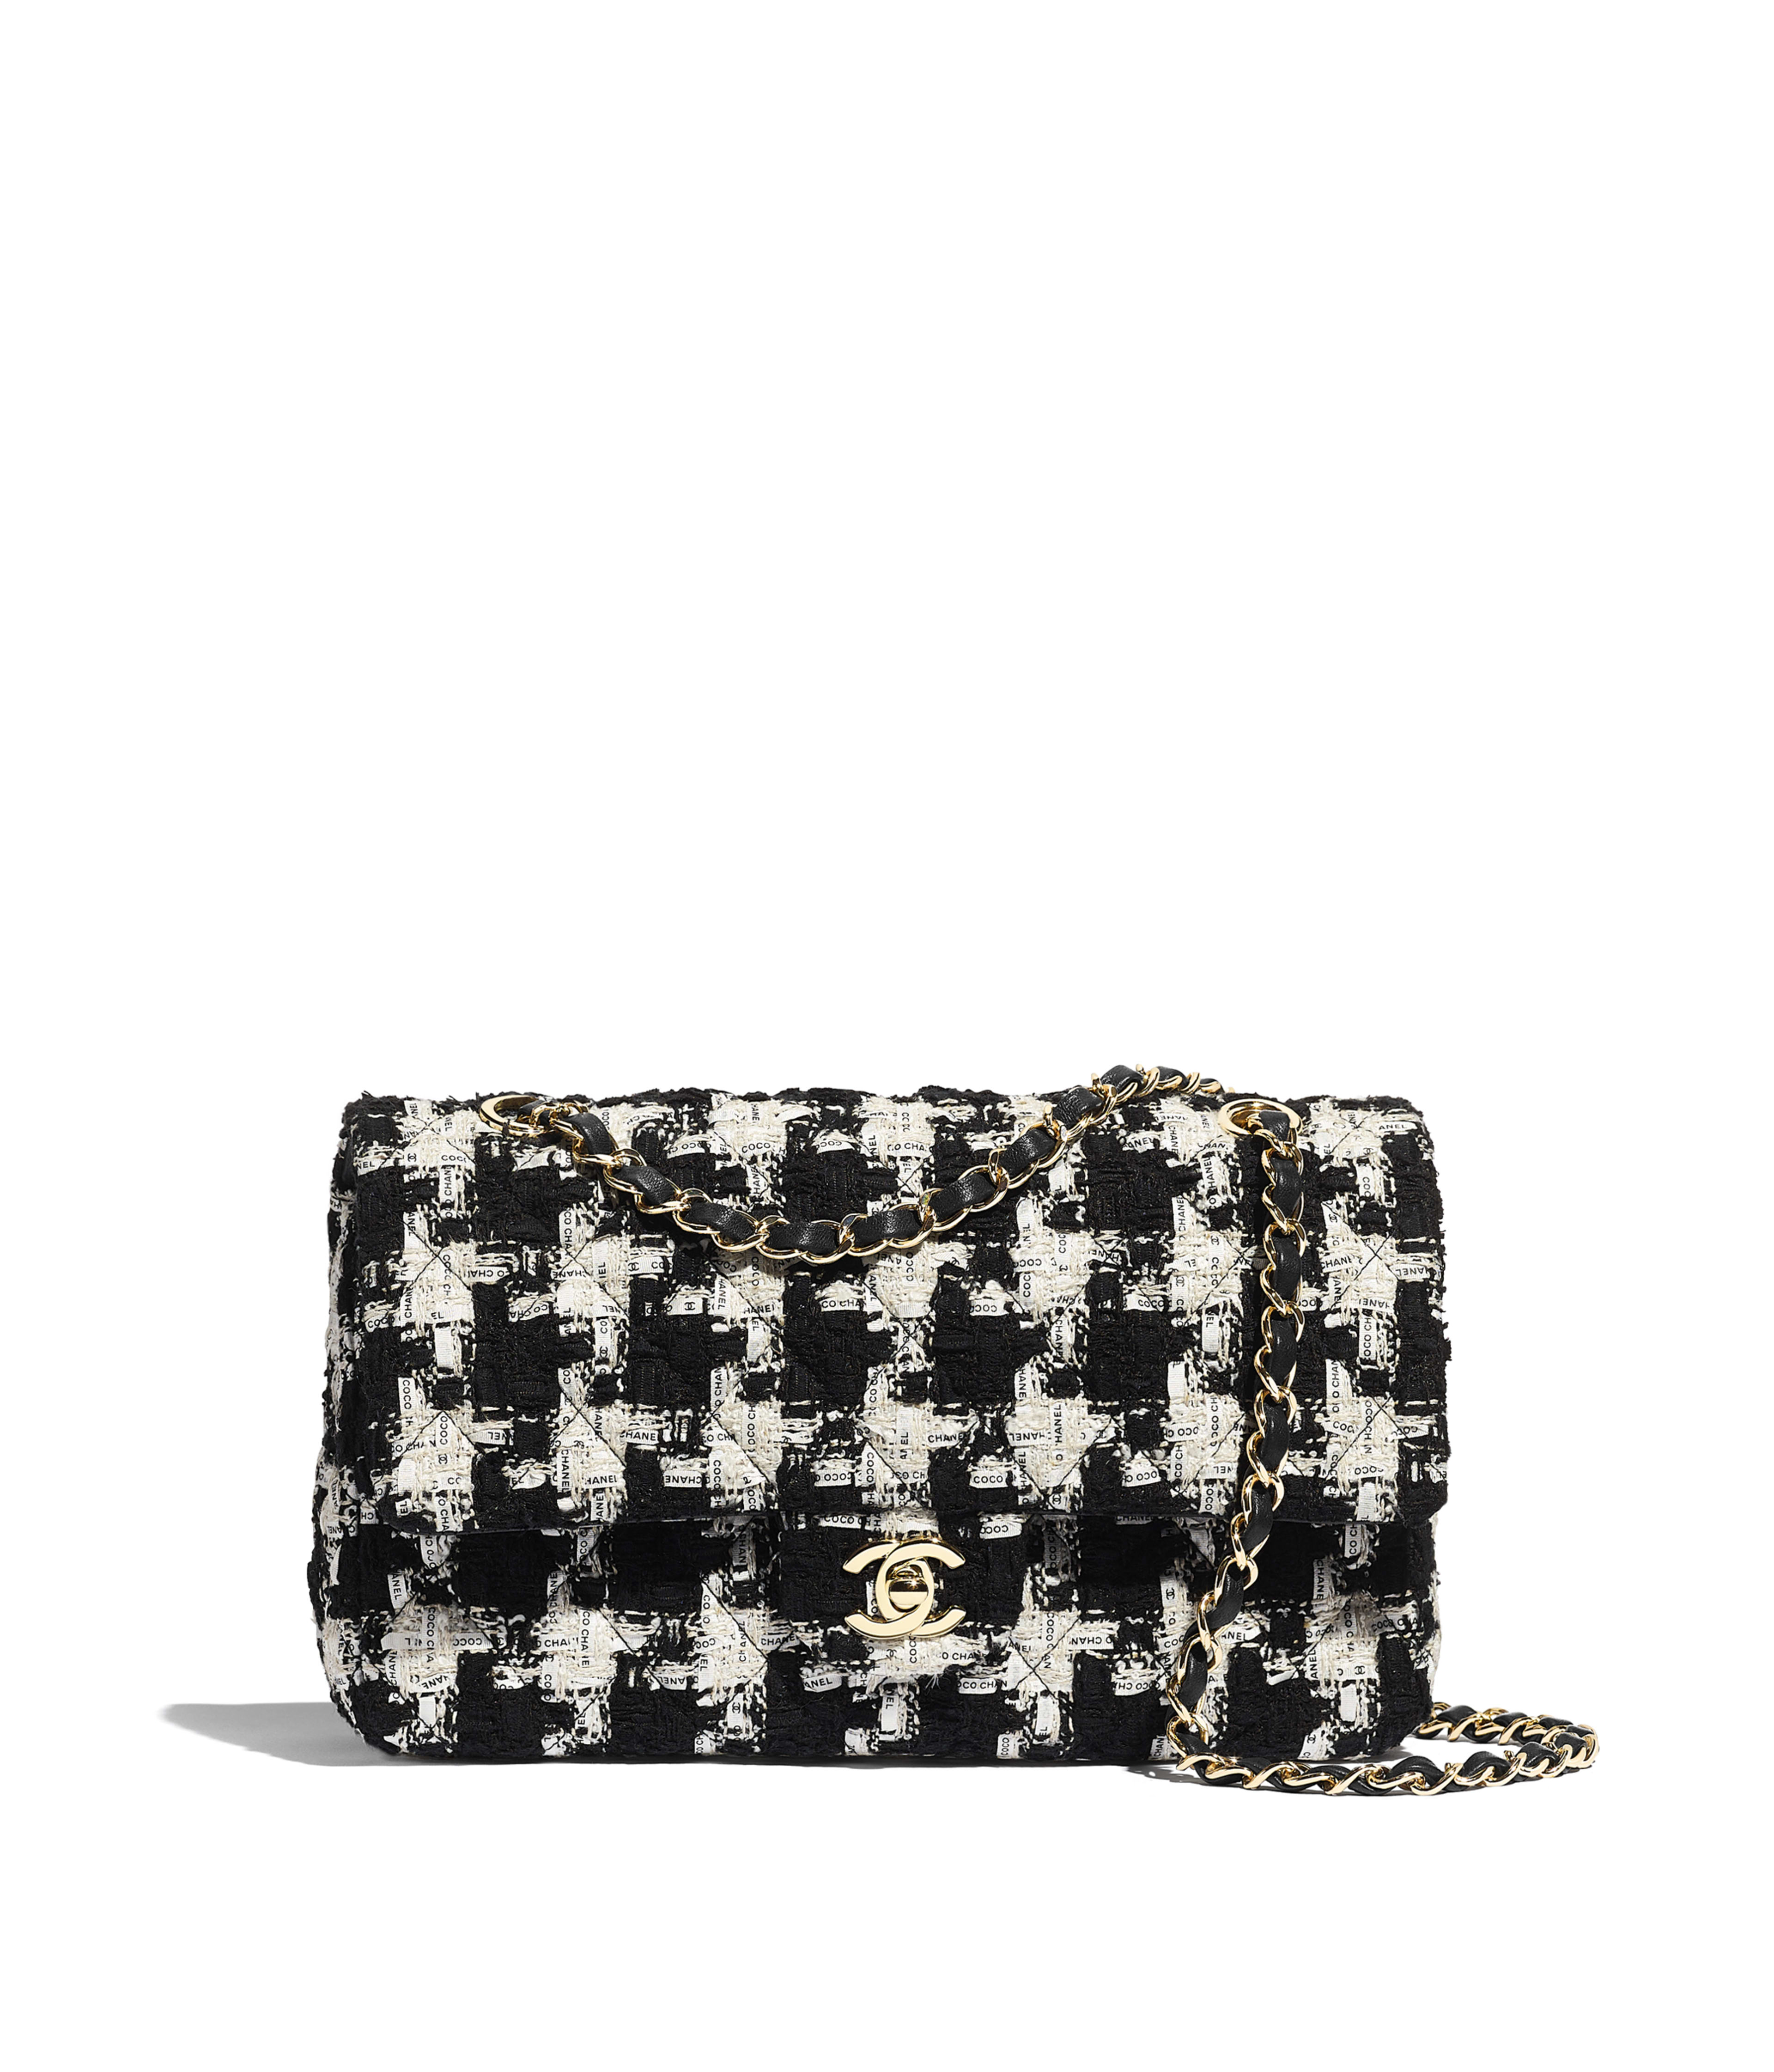 Classic Handbags Chanel